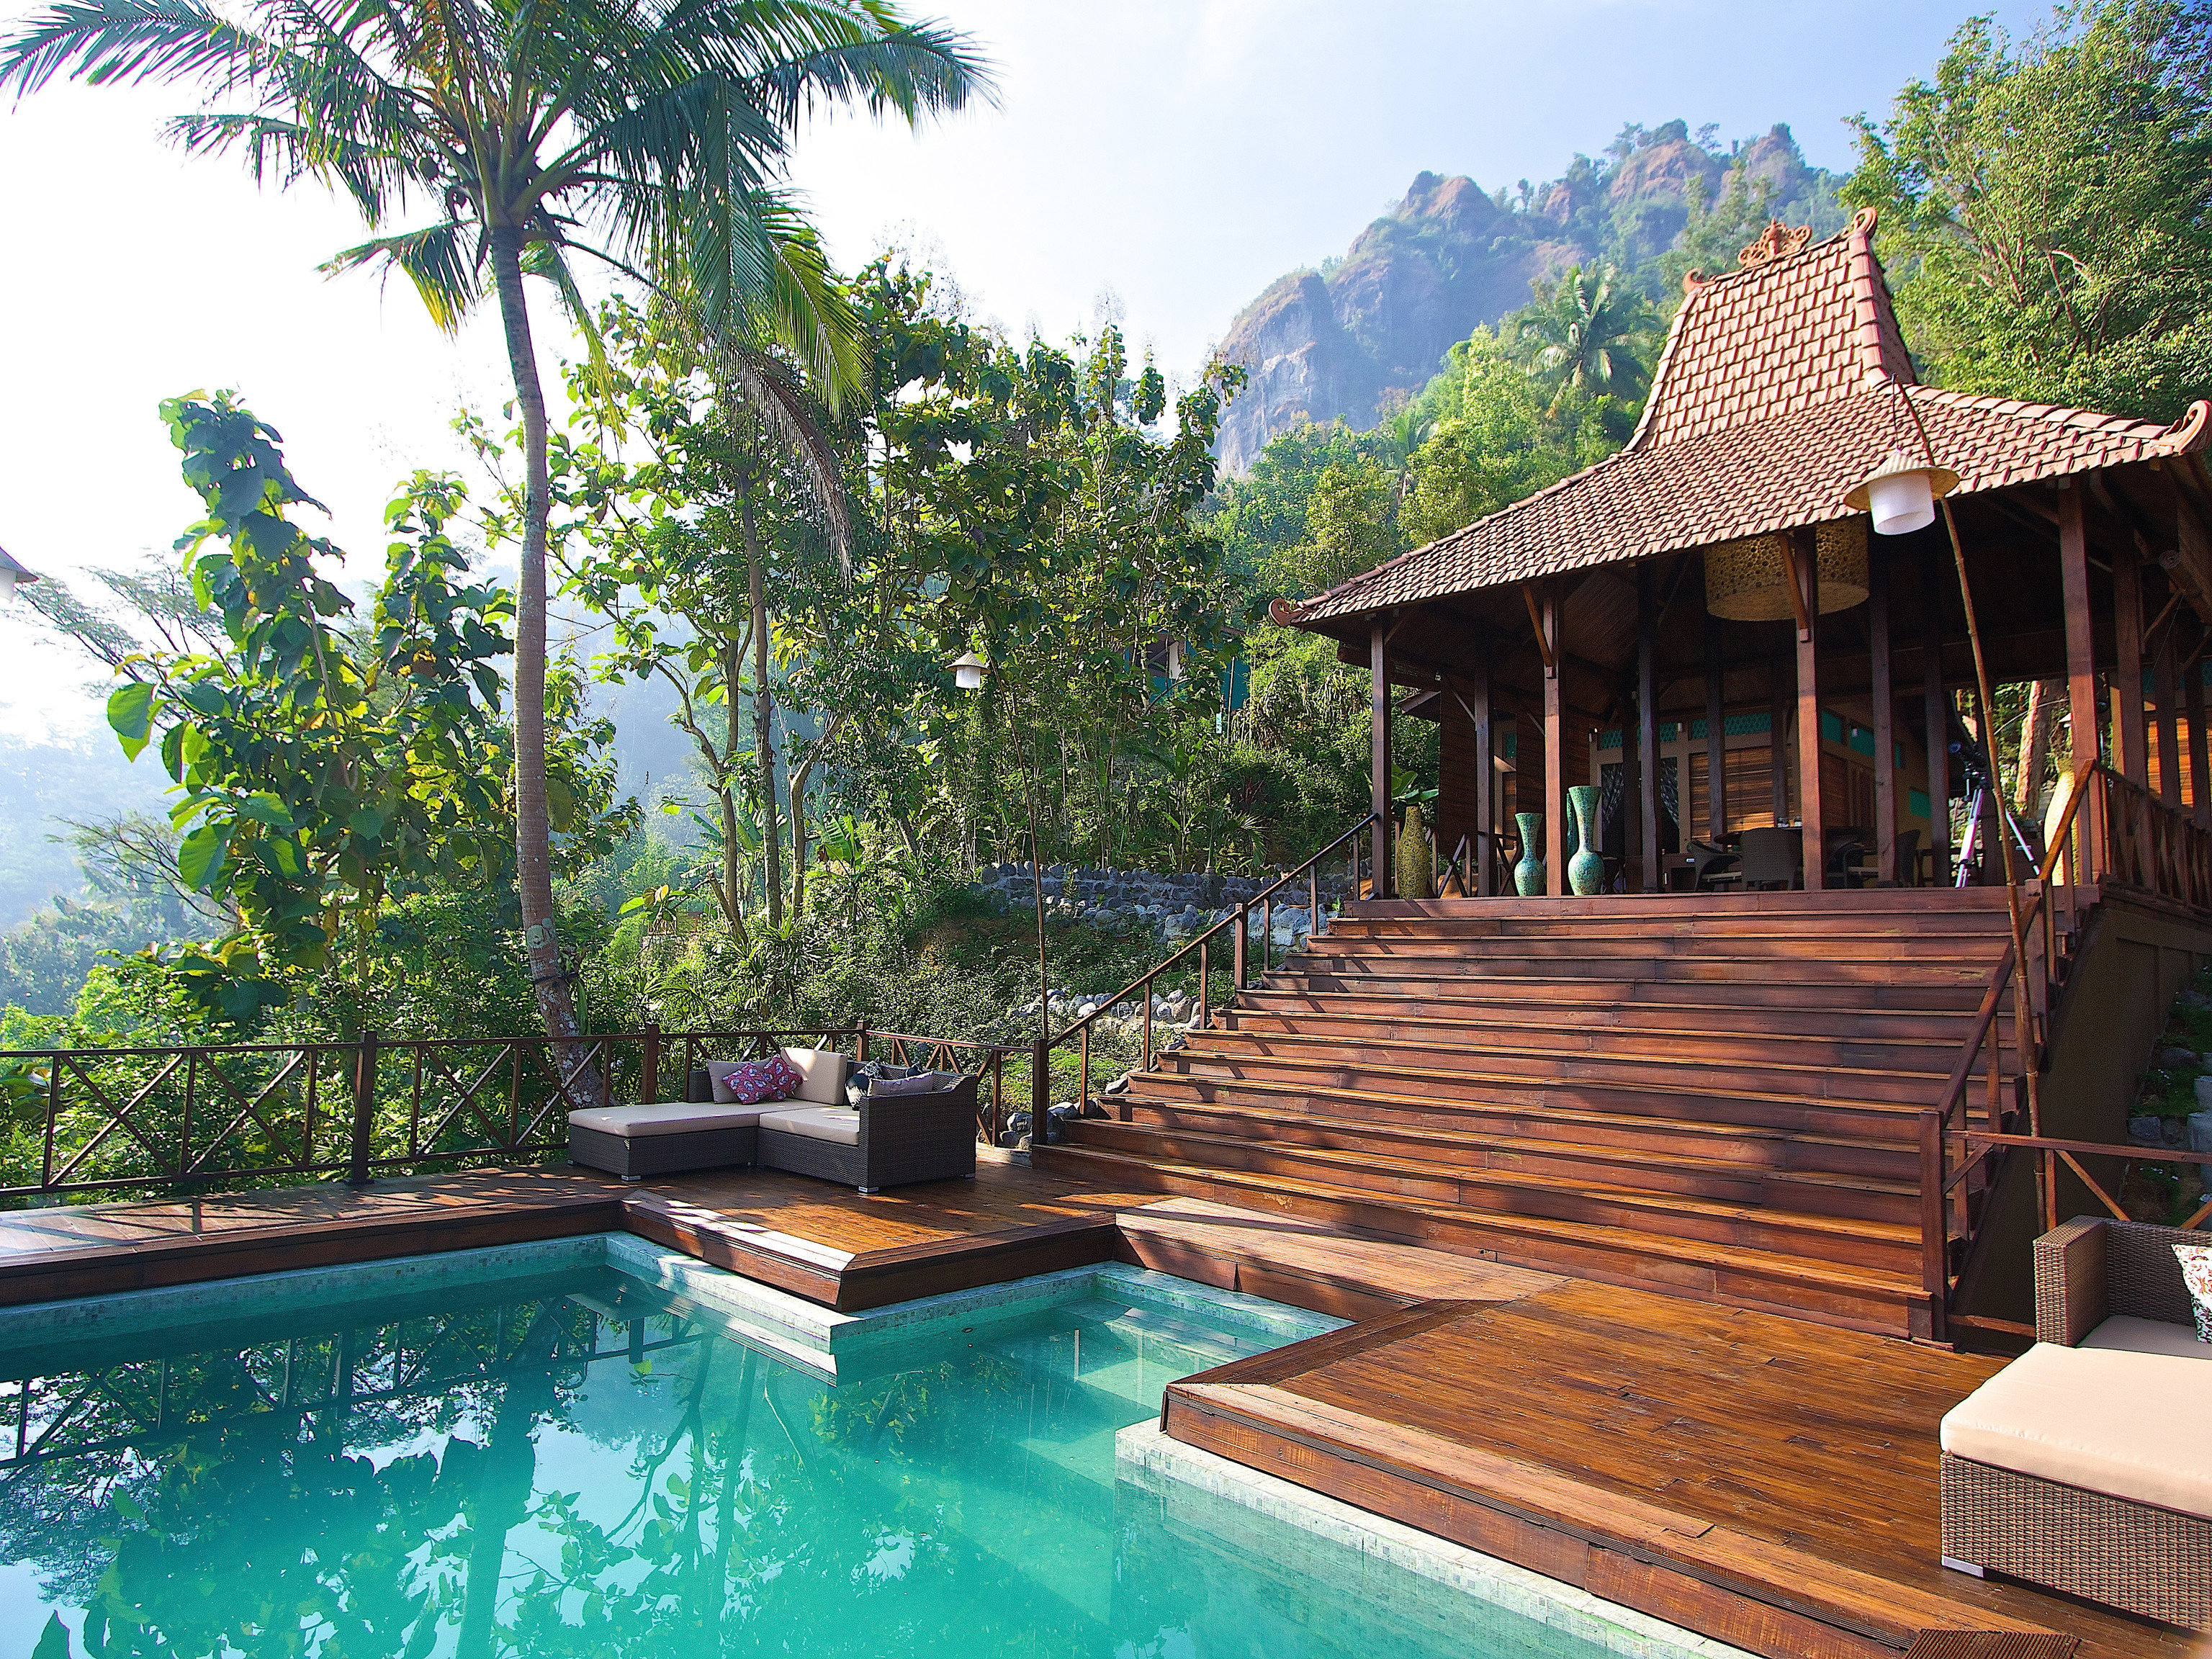 tree swimming pool property Resort Villa eco hotel cottage backyard